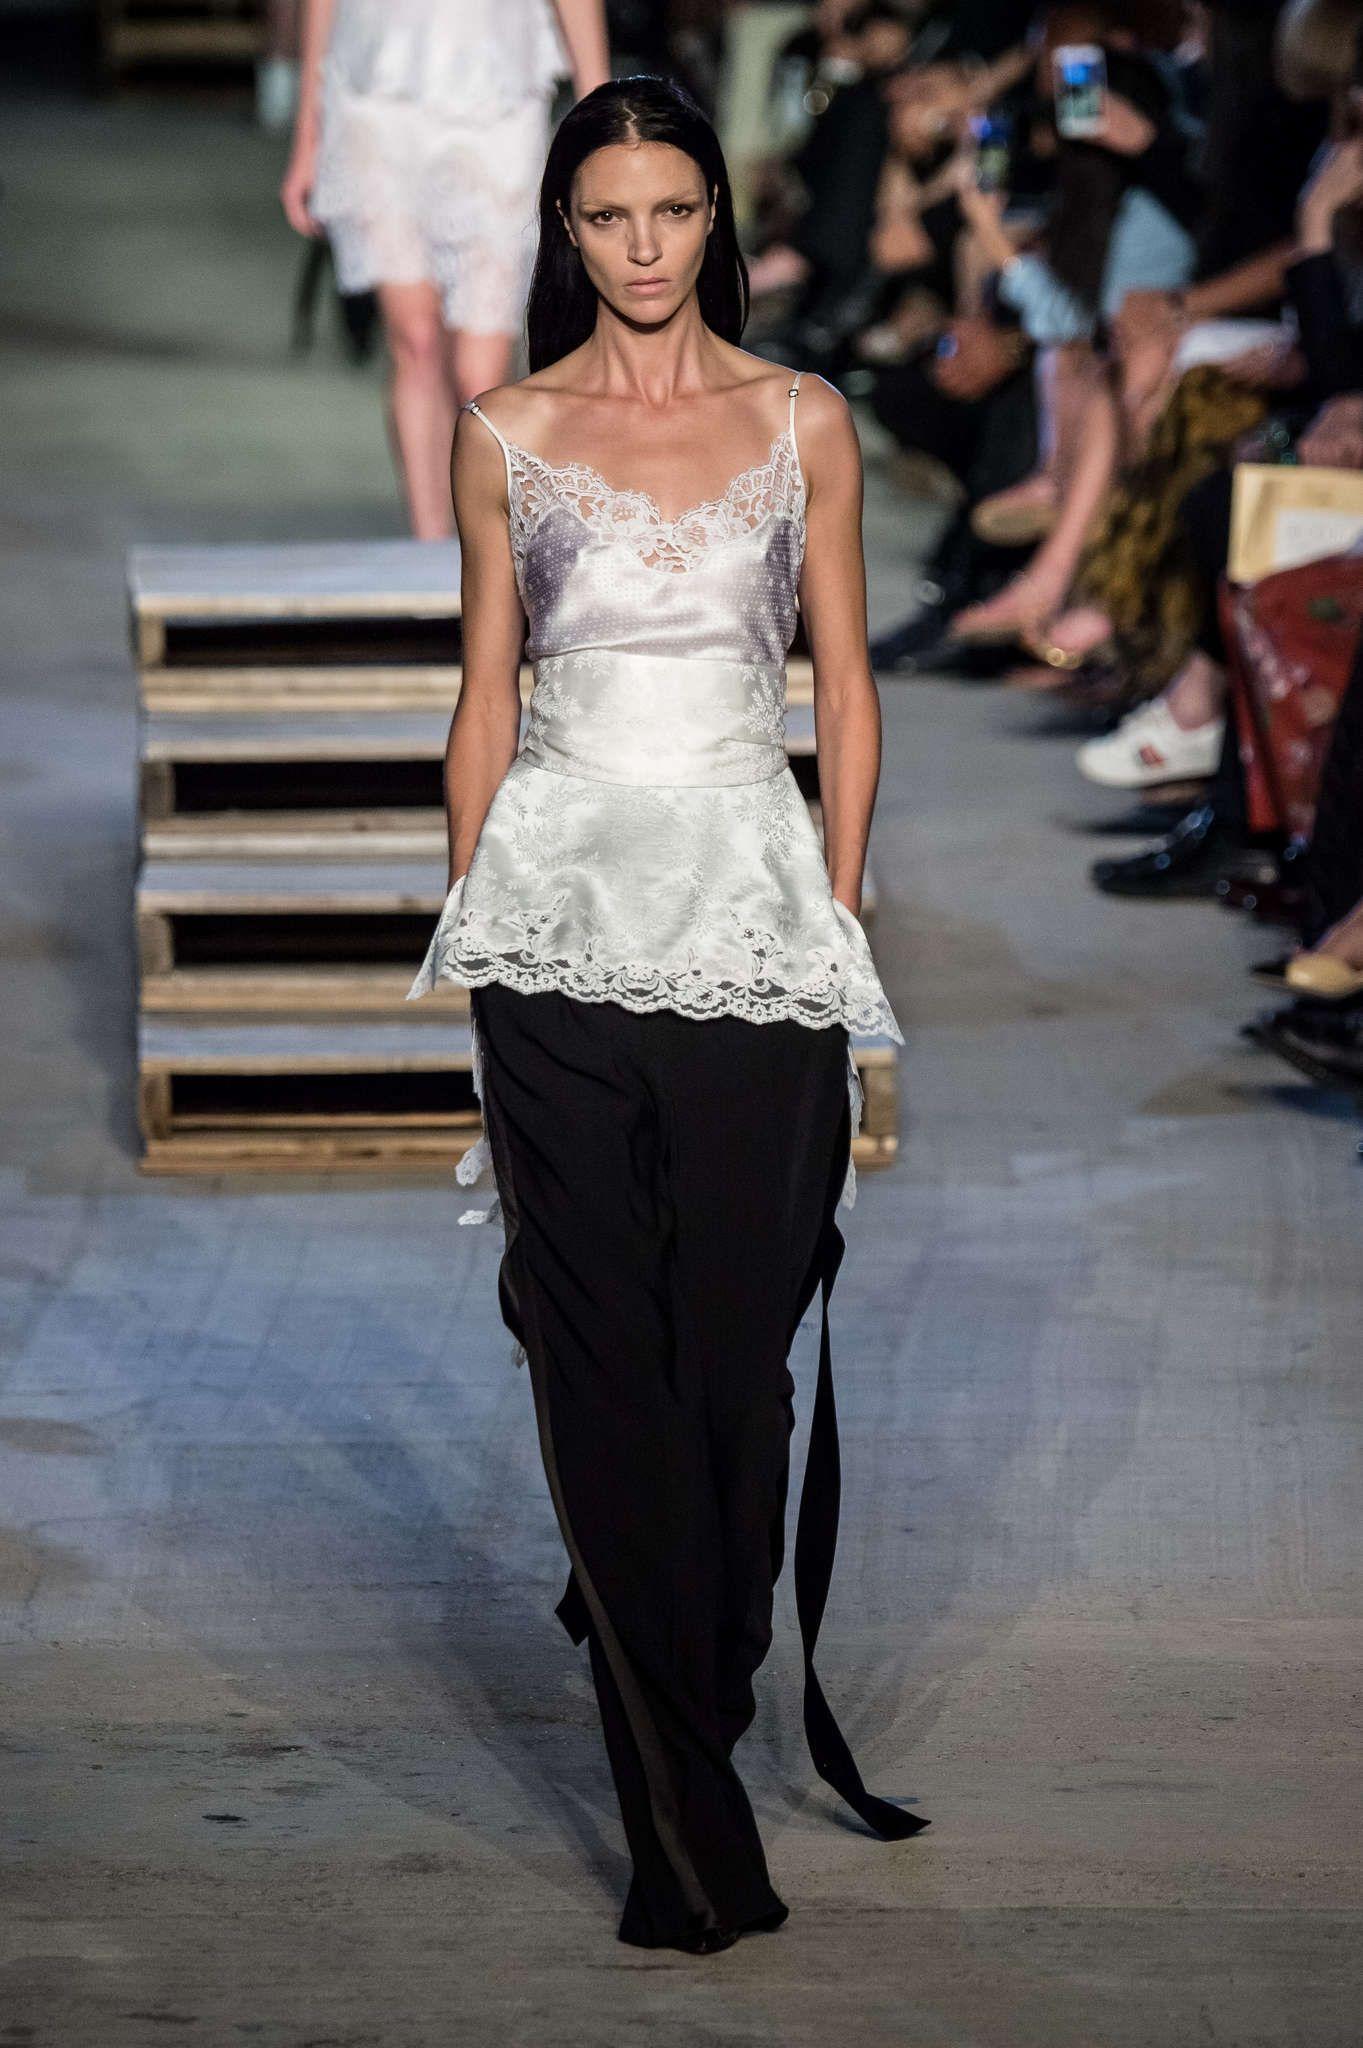 Givenchy Spring-Summer 2016, Womenswear - Catwalks (#22597)